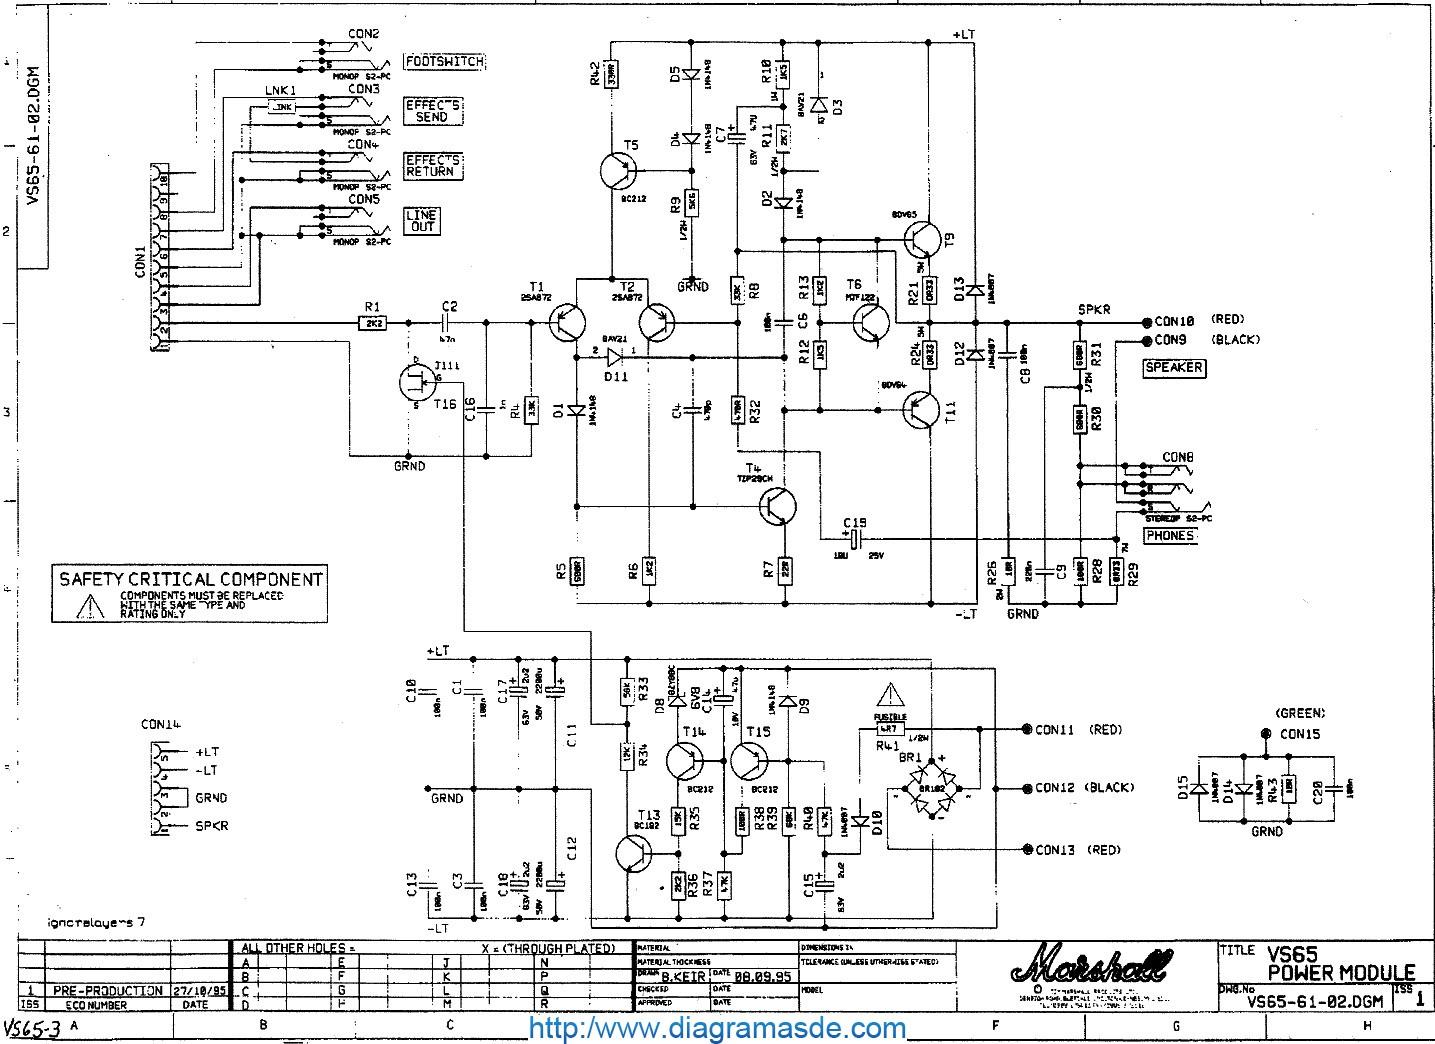 valvestate65_pwr.pdf